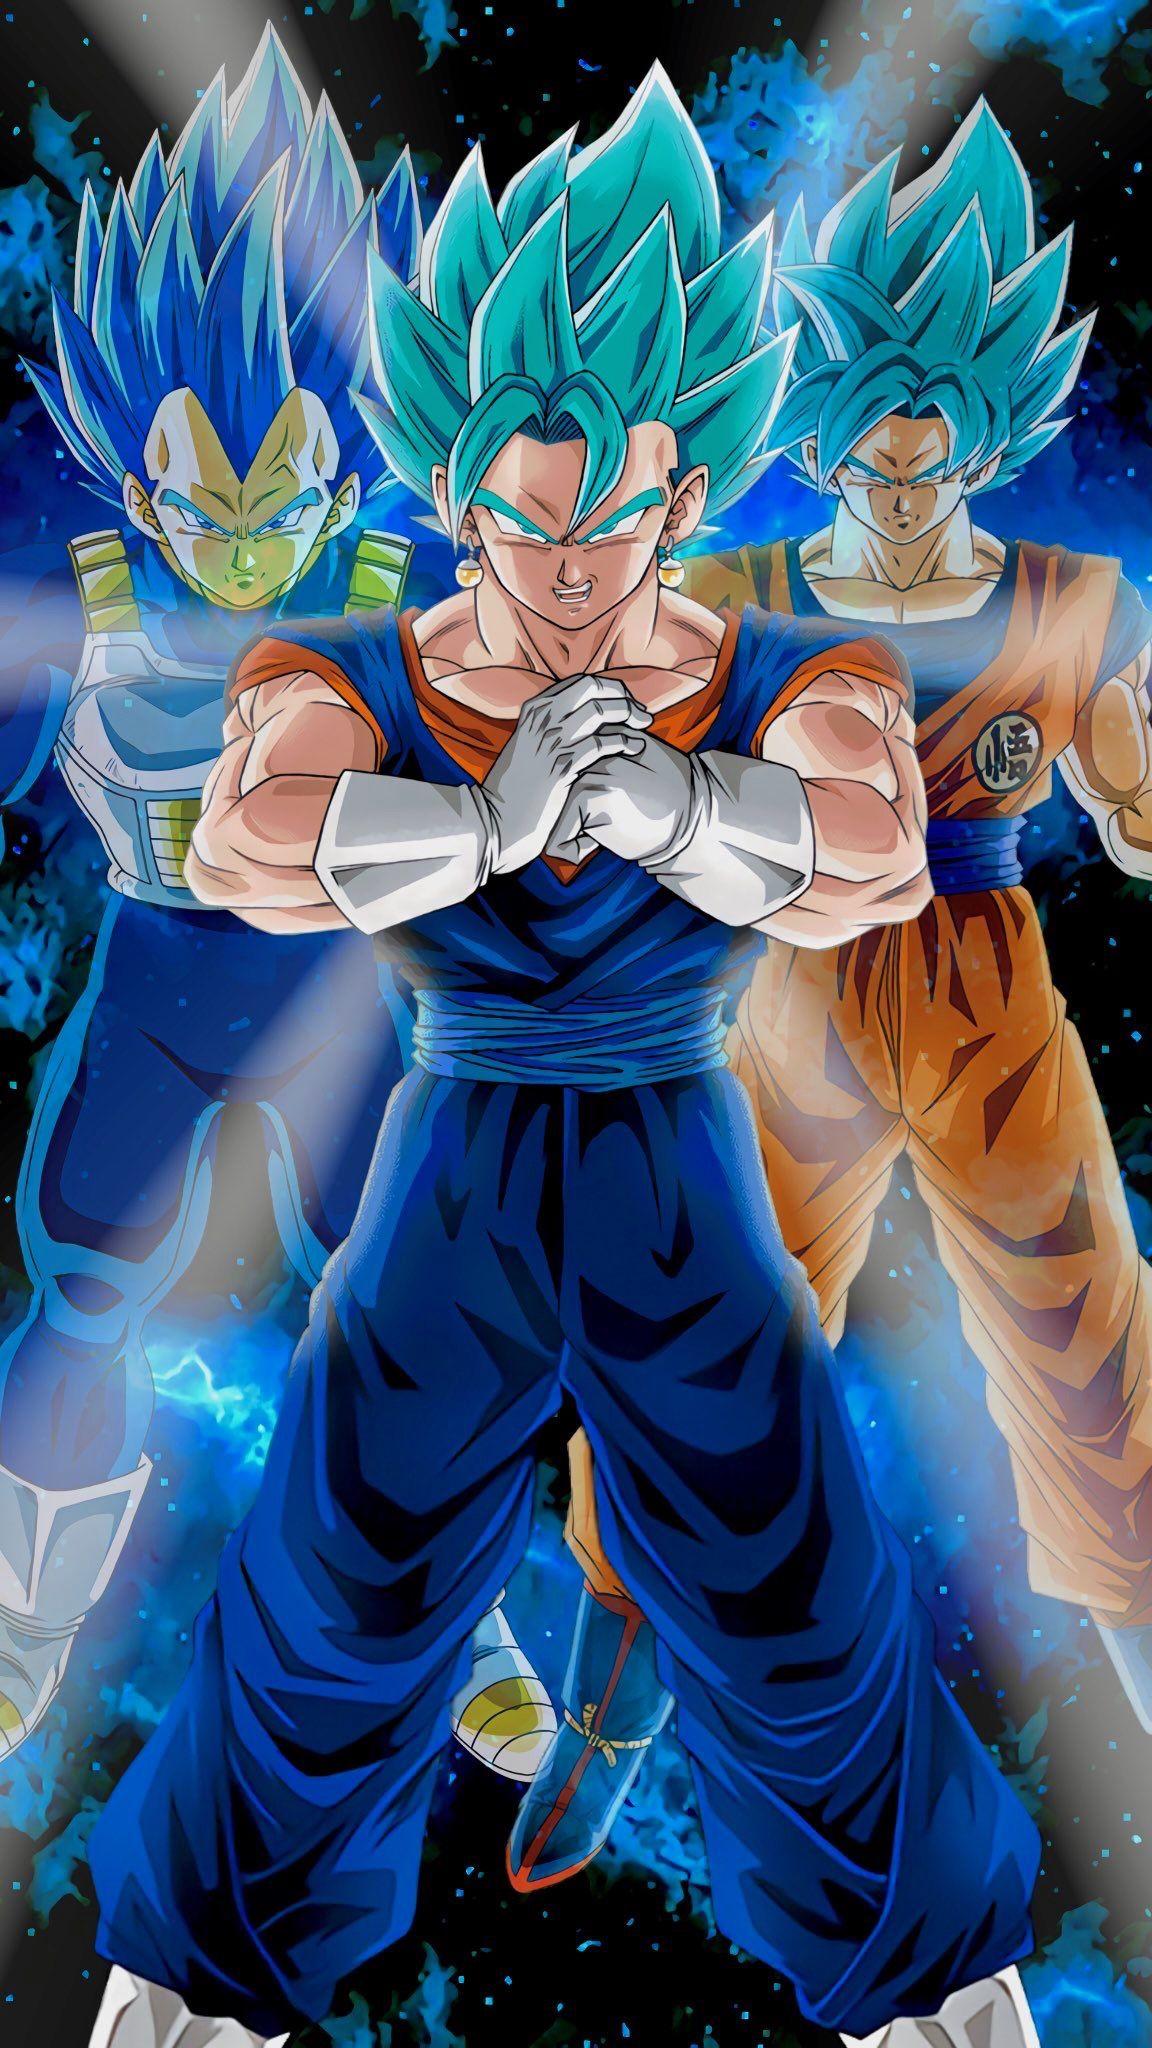 Pin By Gustavo Britez On Dragon Ball Anime Dragon Ball Super Dragon Ball Goku Dragon Ball Super Manga